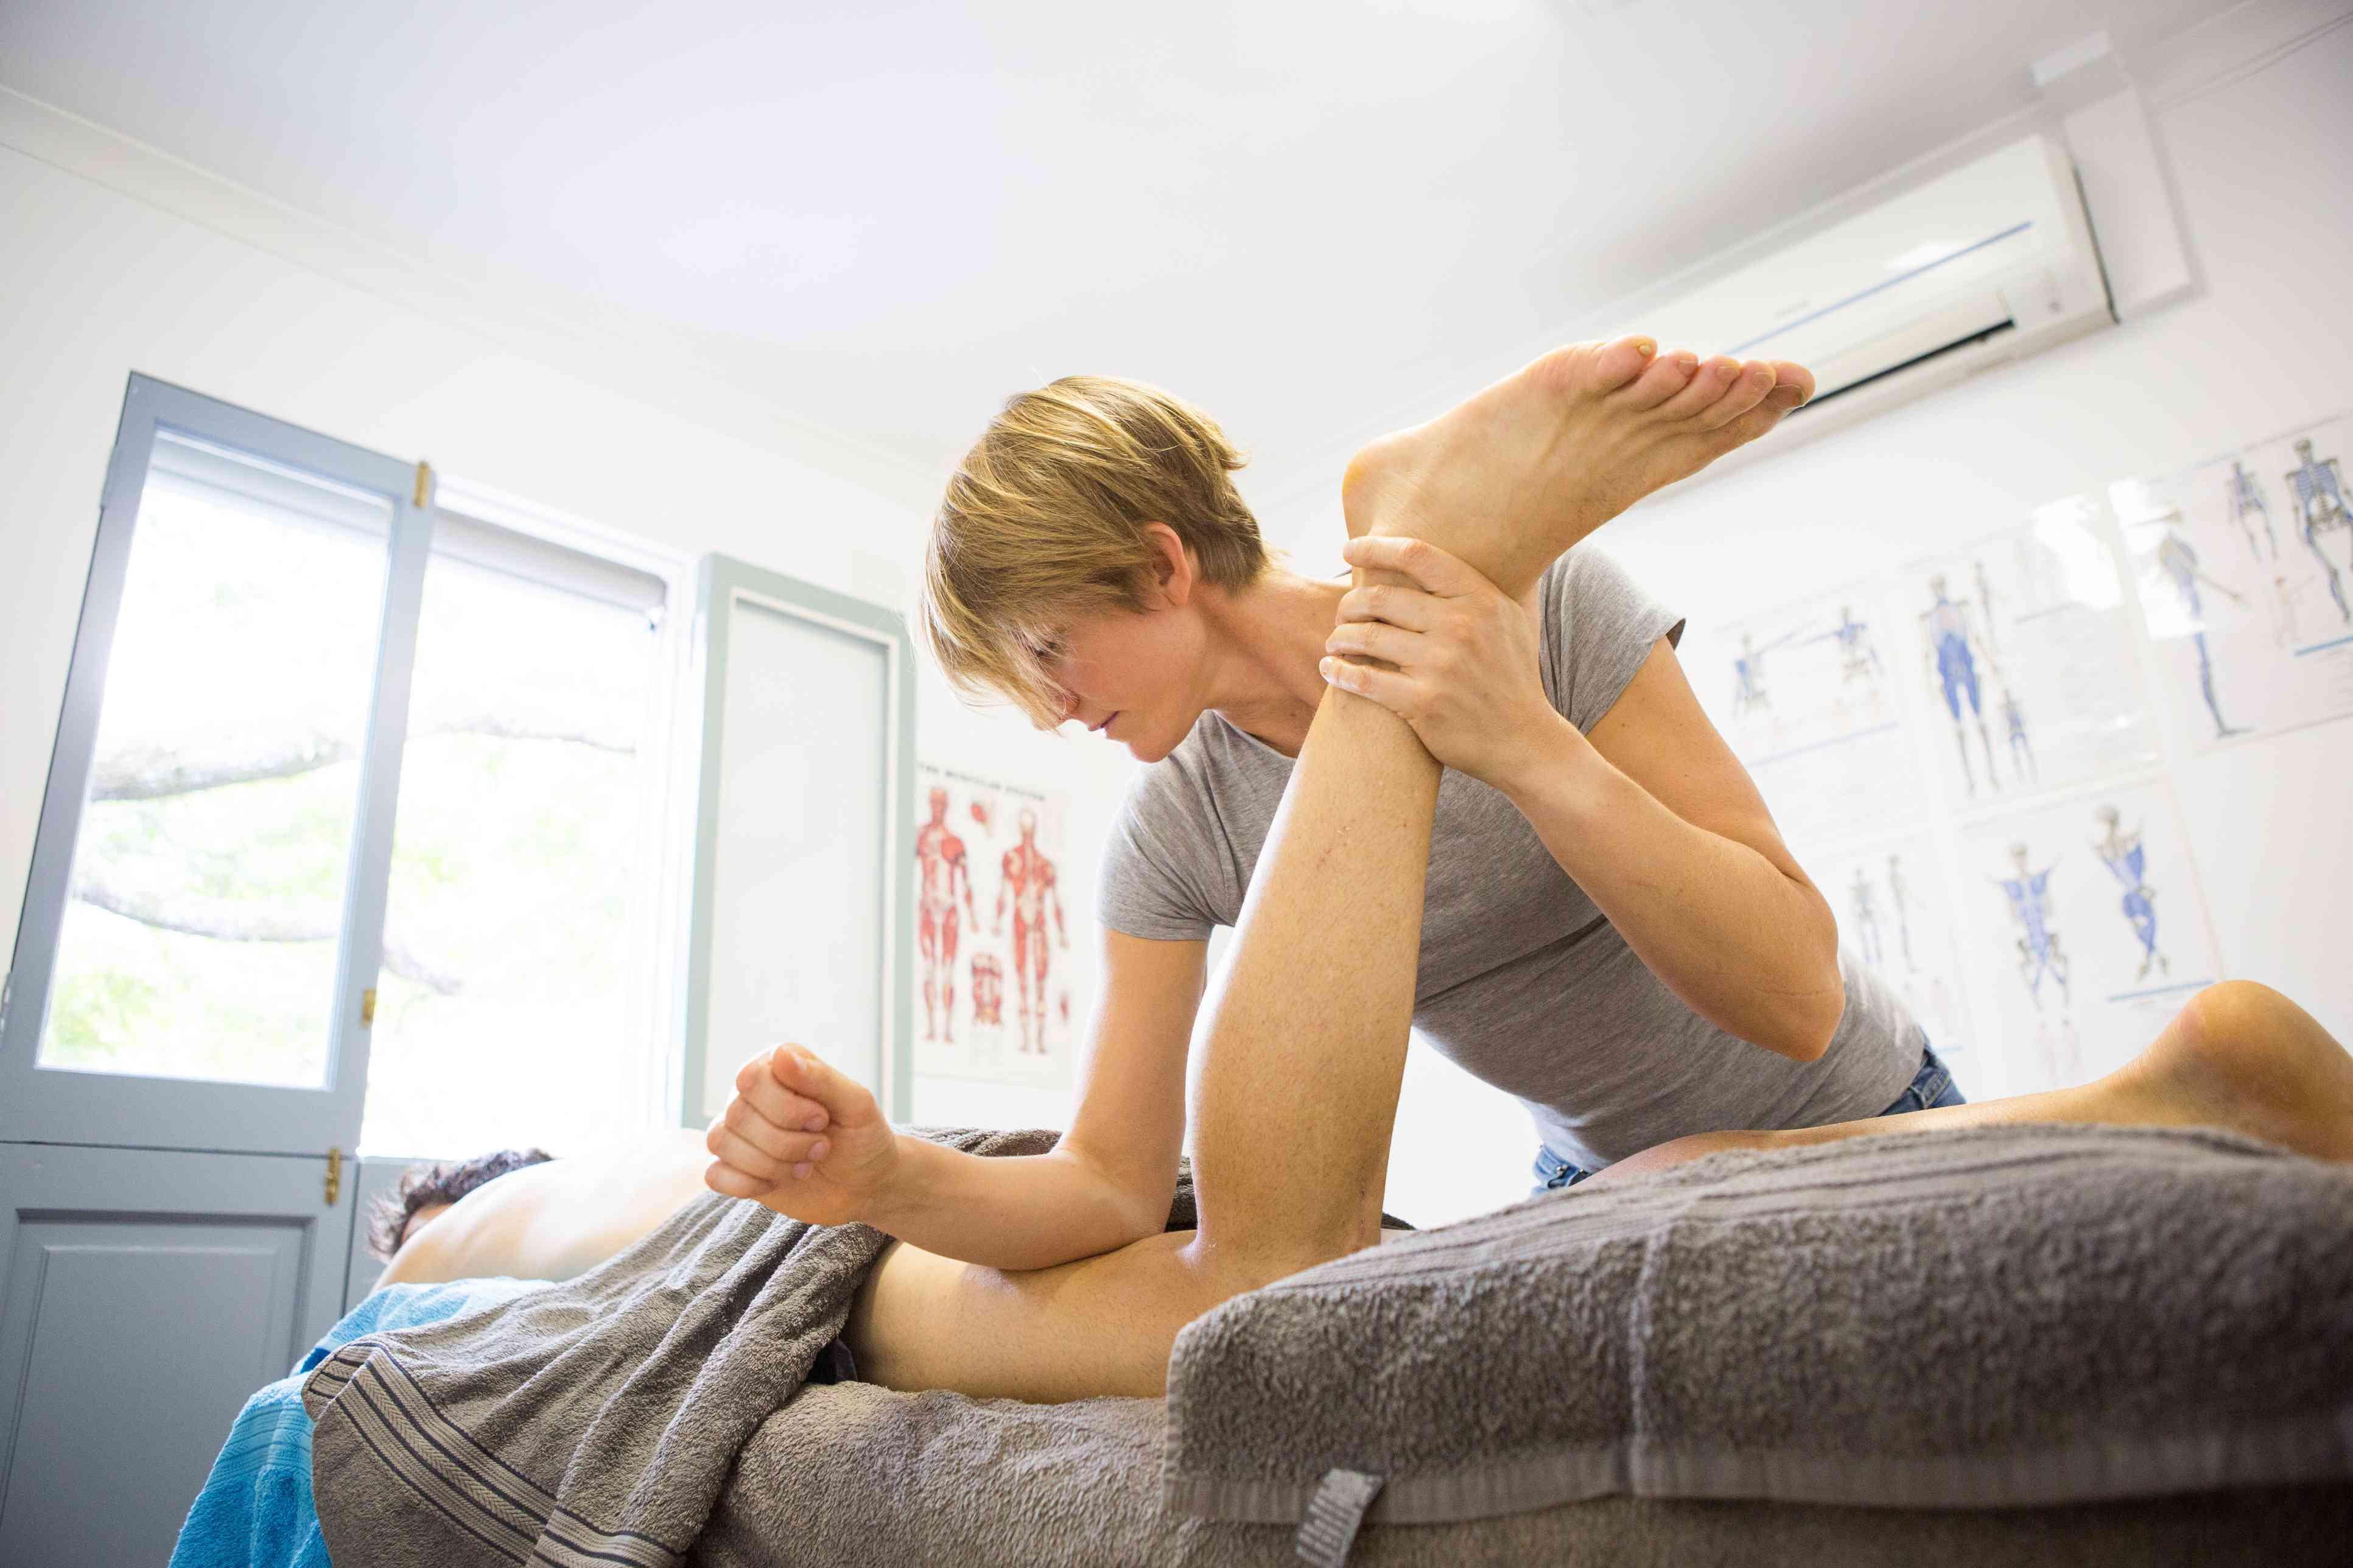 Sports massage therapist working on a patient's leg